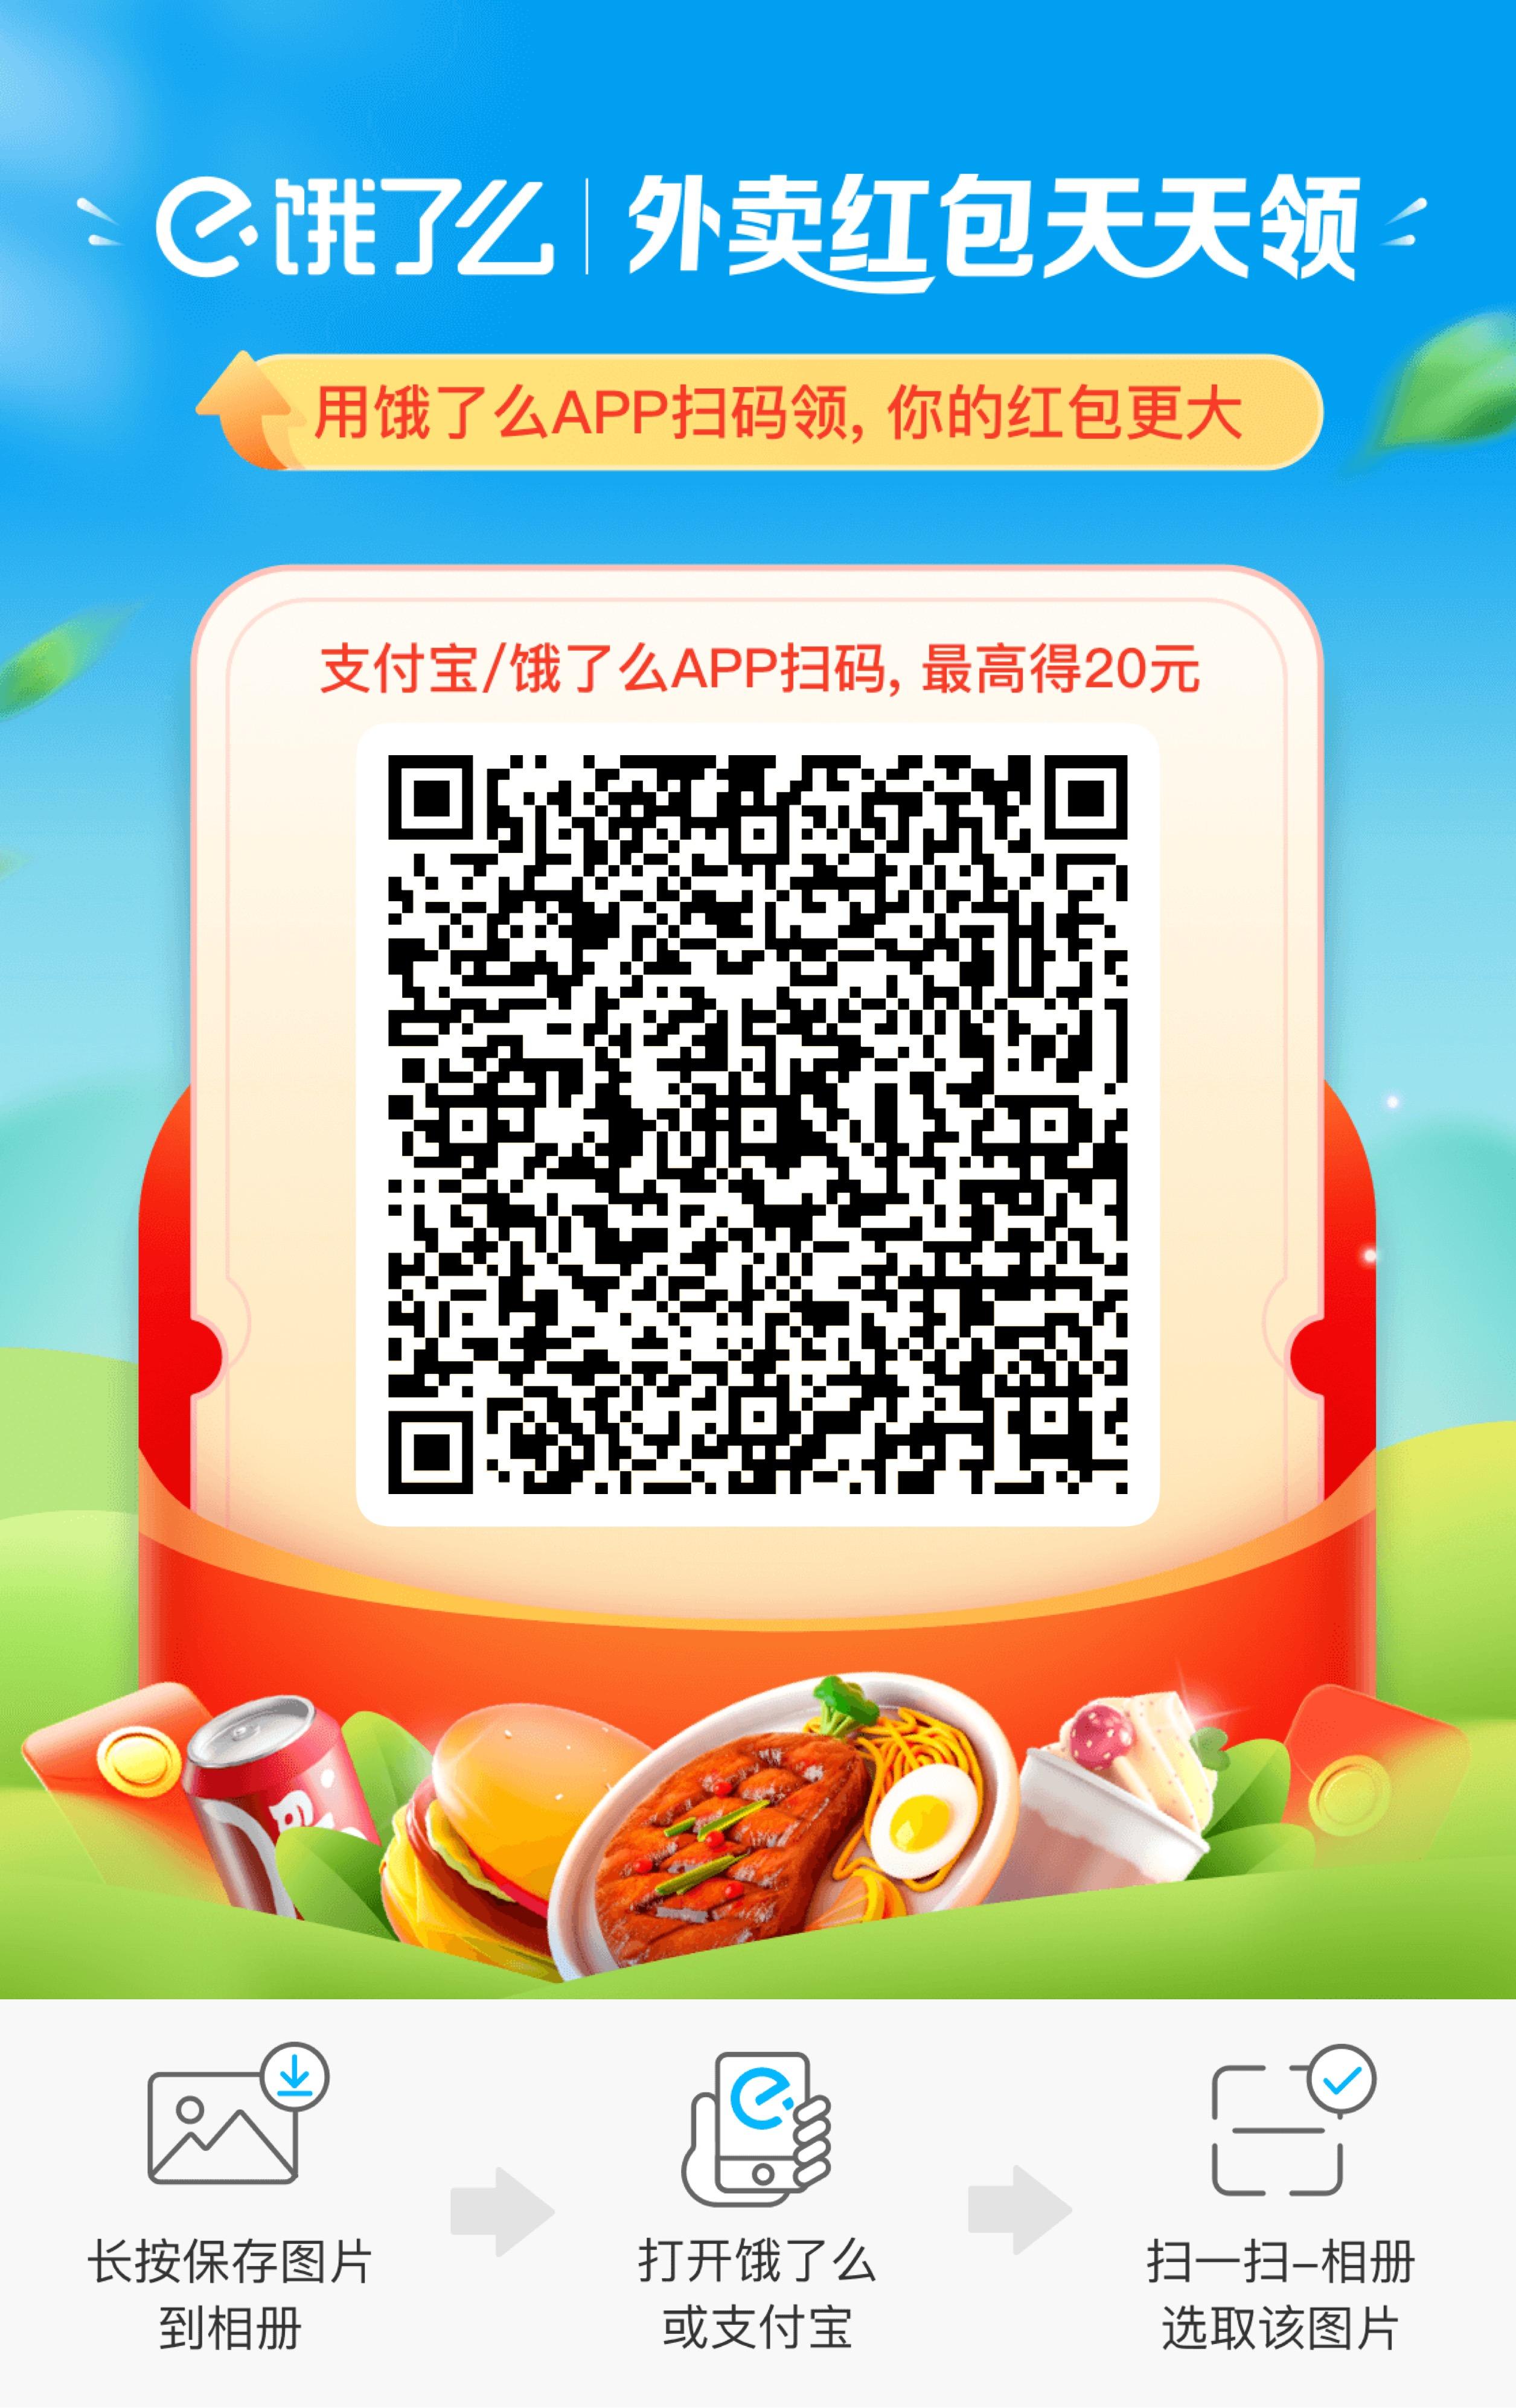 IMG_3875(20210913-020943).JPG